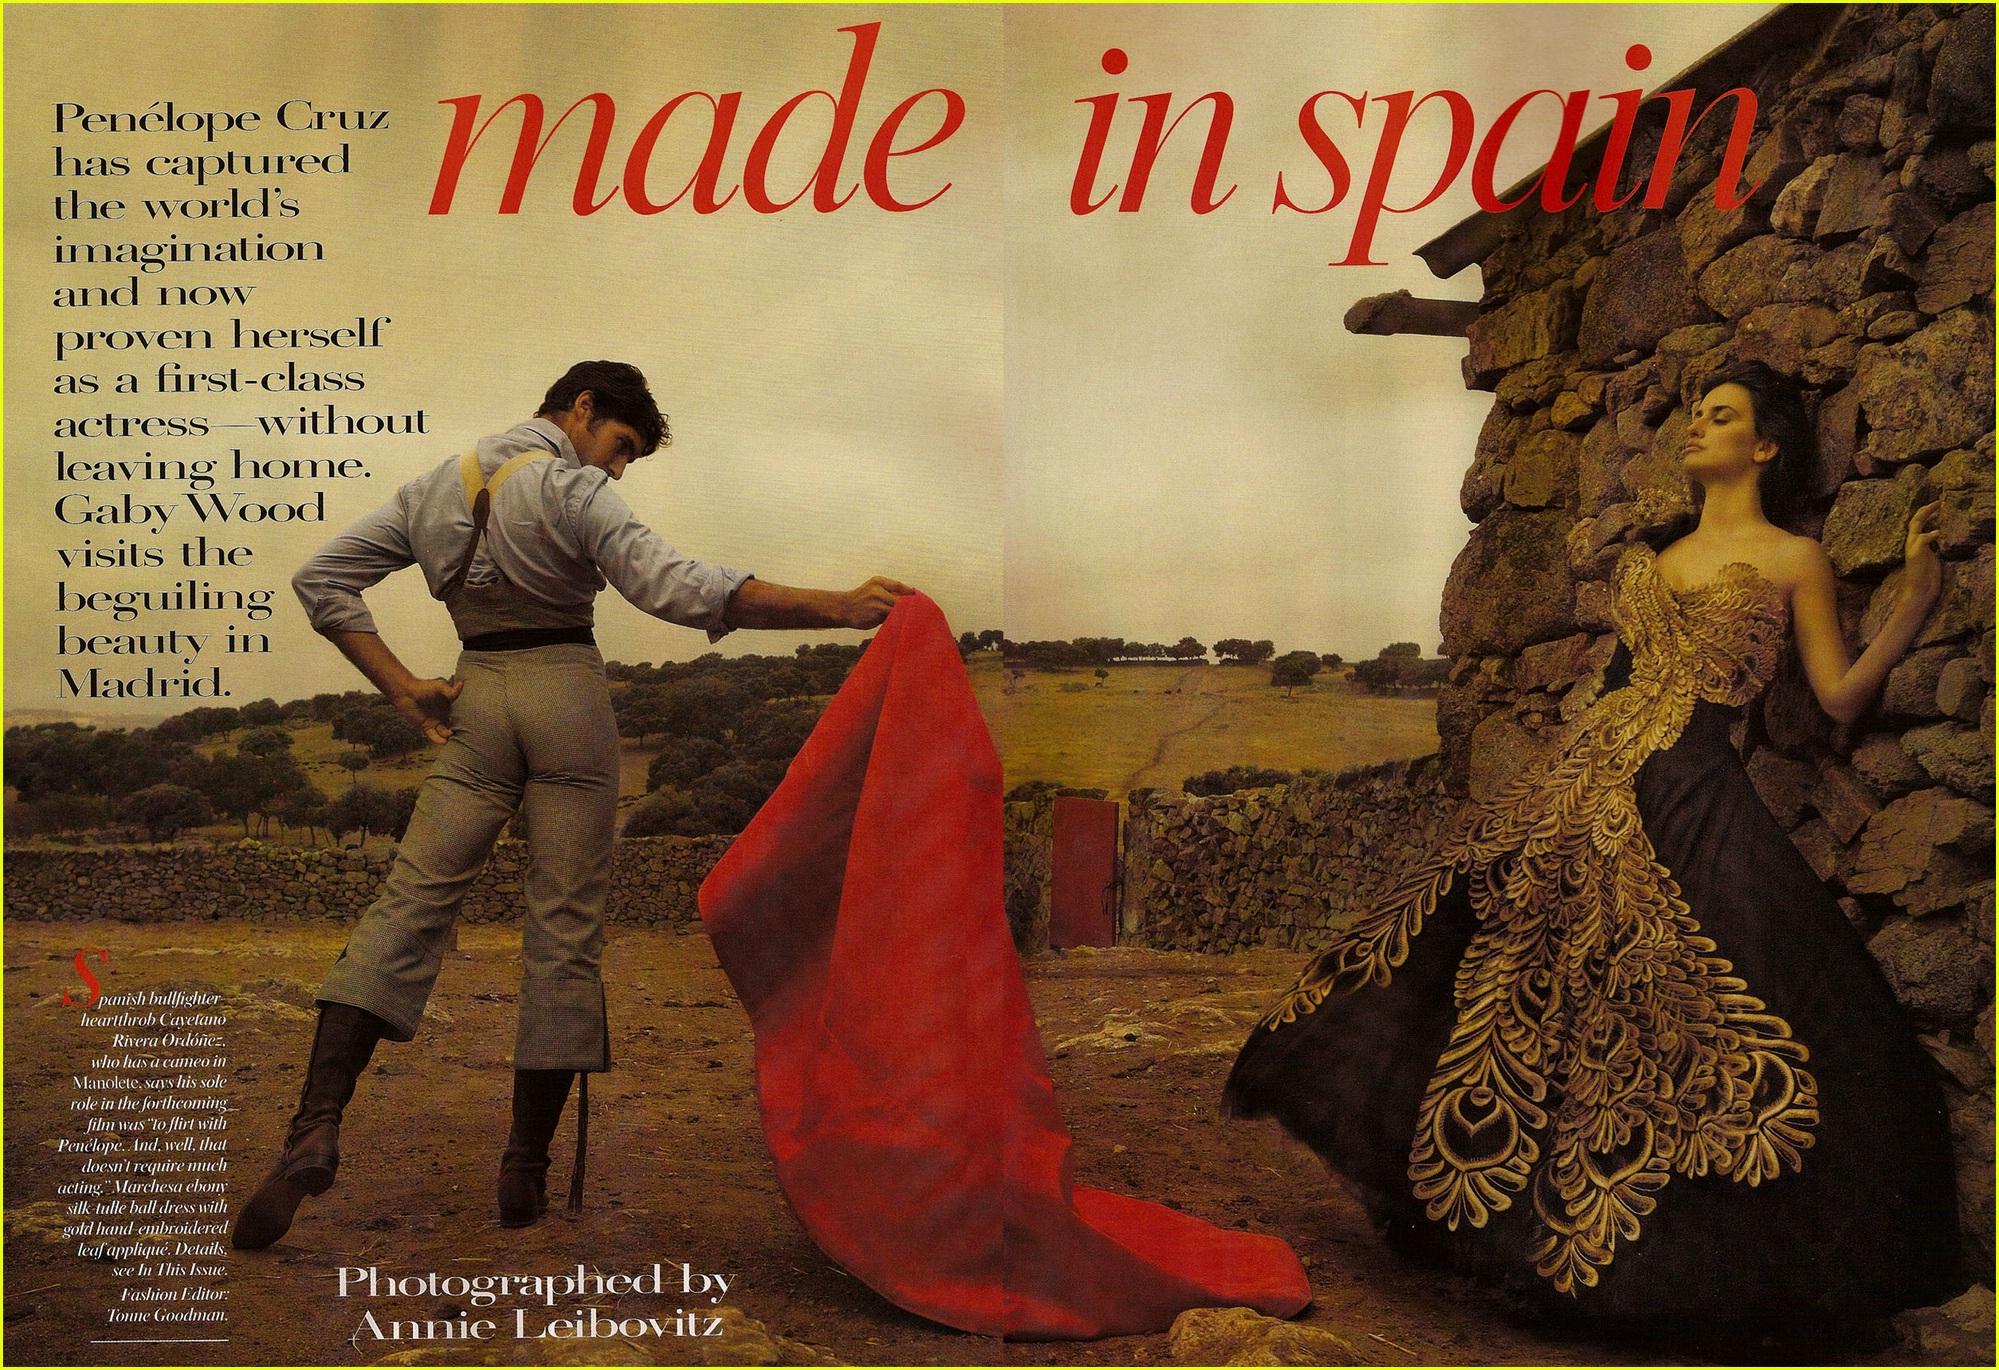 Made in Spain: nuestra cultura según Annie Leibovitz